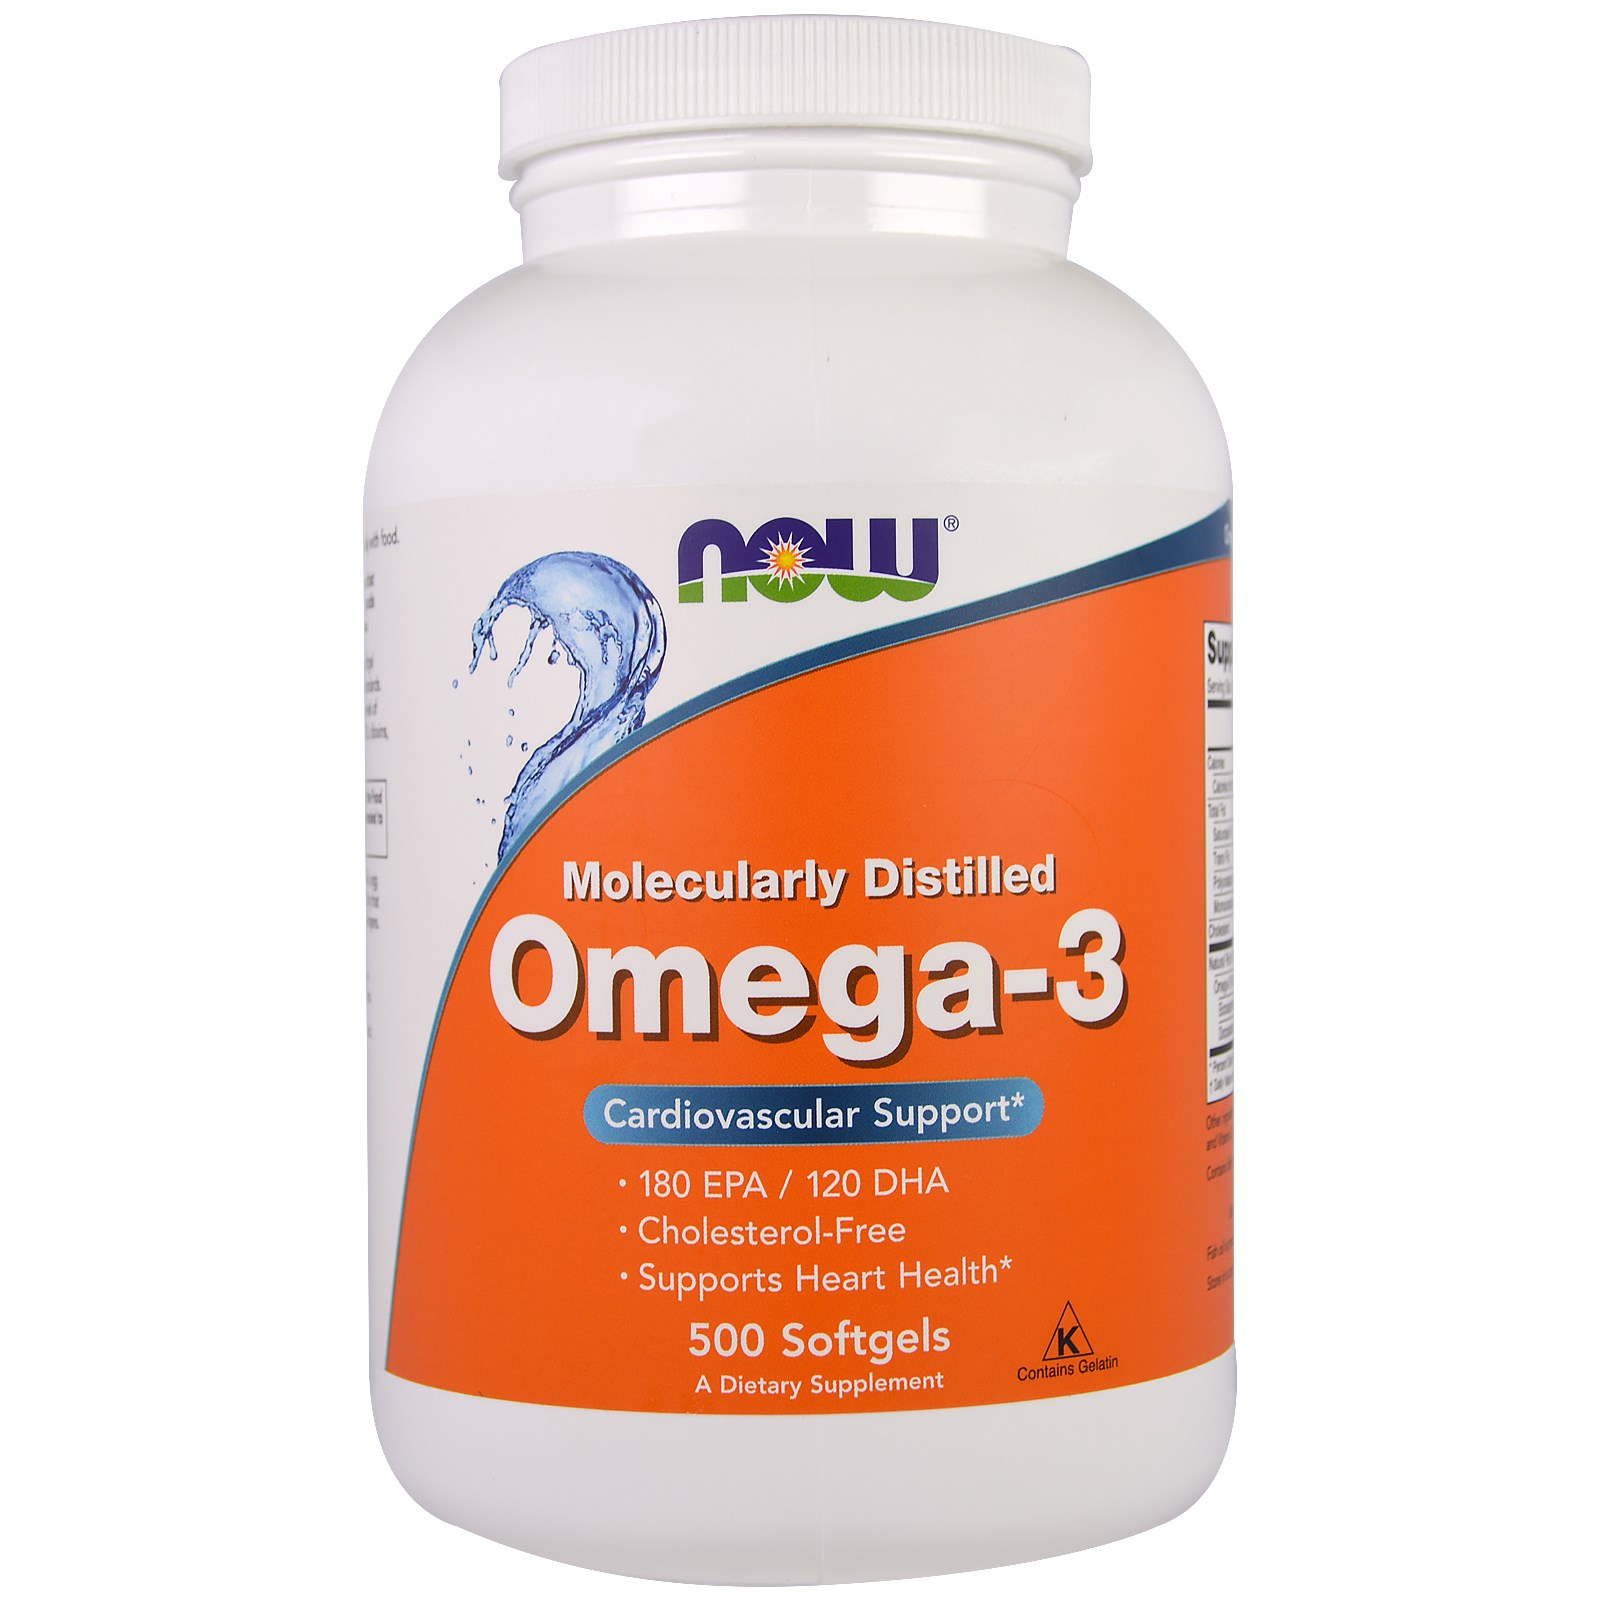 Image of Omega-3 (500 Softgels) - Now Foods 0733739016539